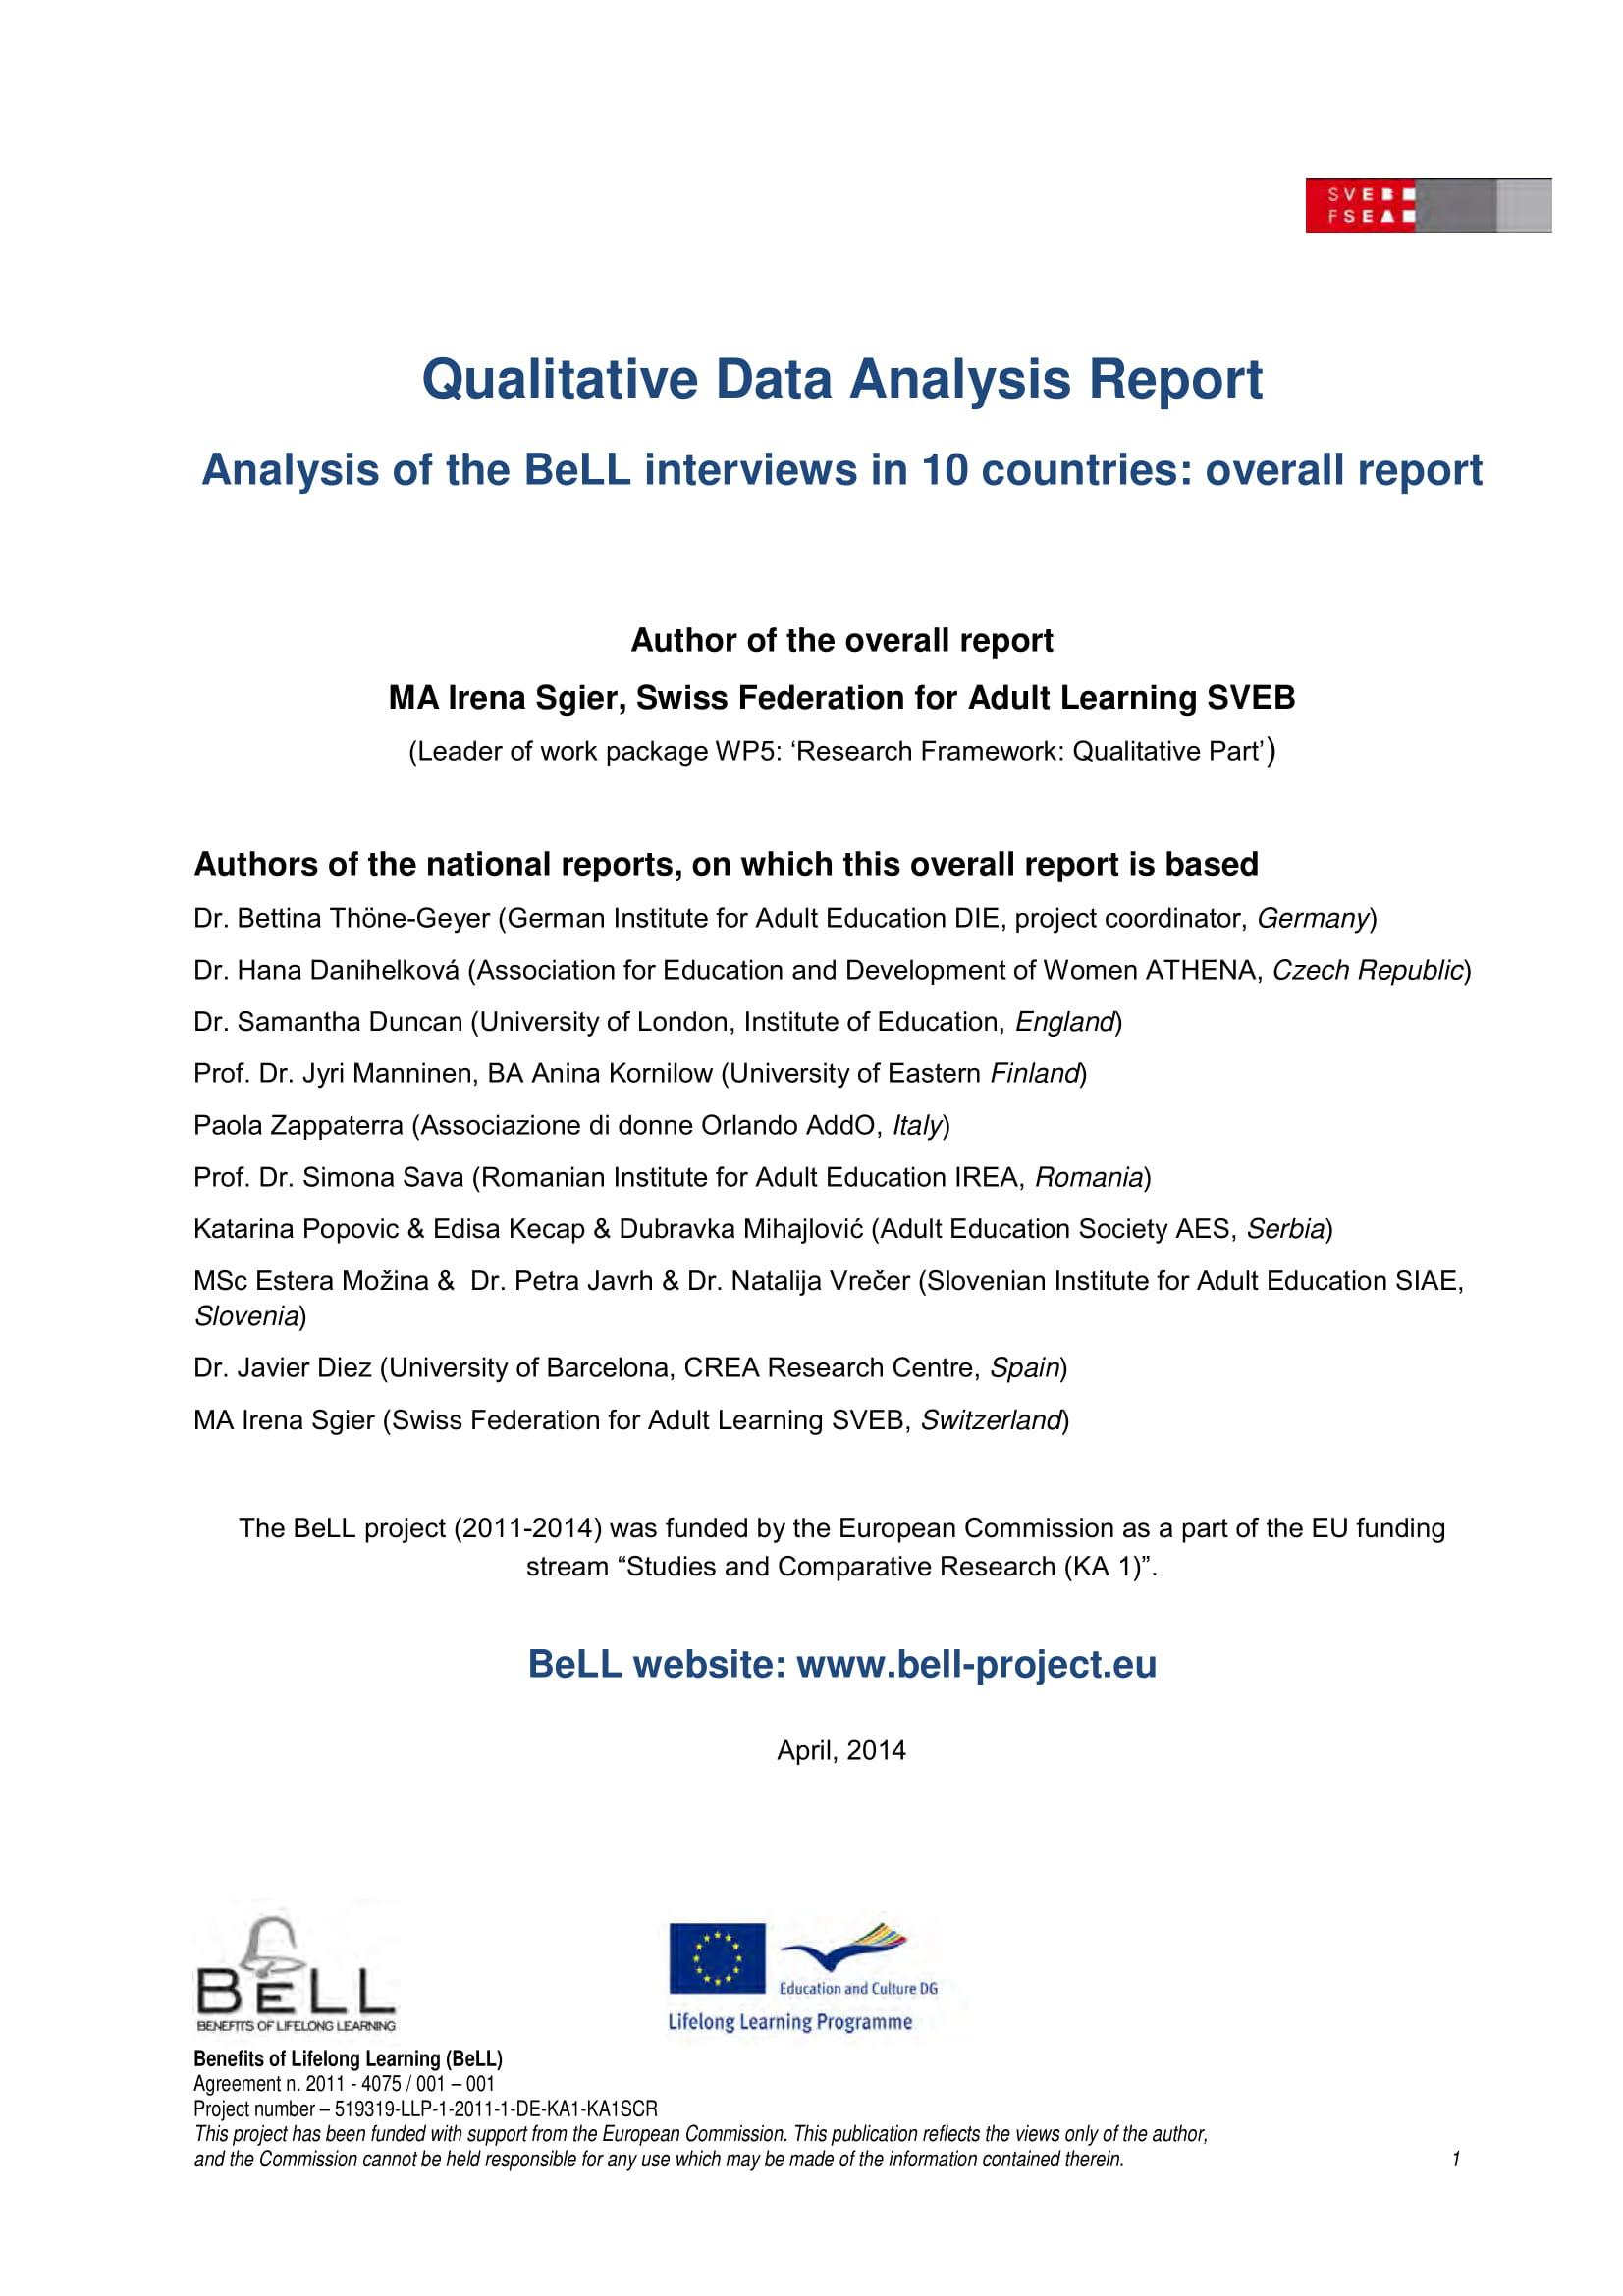 qualitative data analysis report example 001